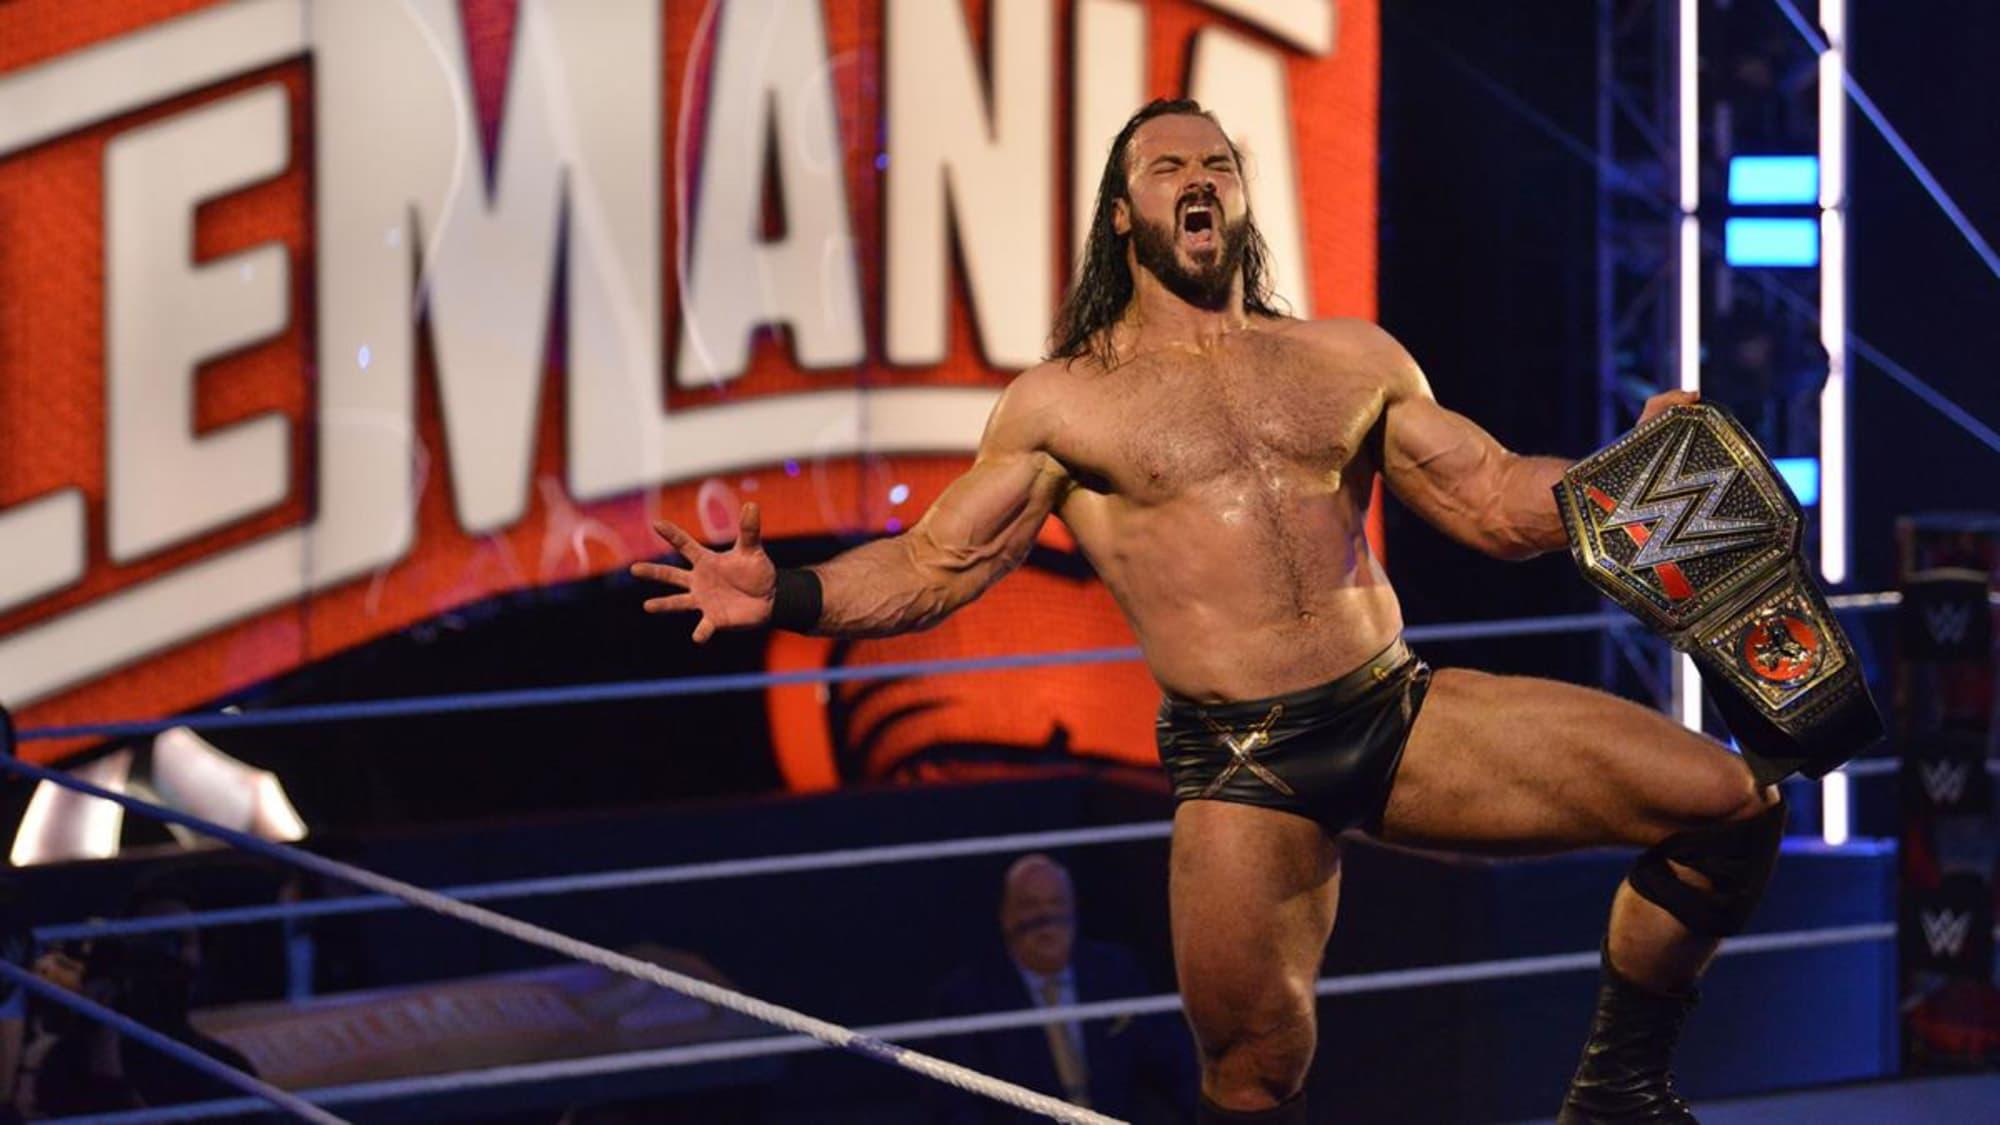 WWE wants fans in attendance at WrestleMania 37?